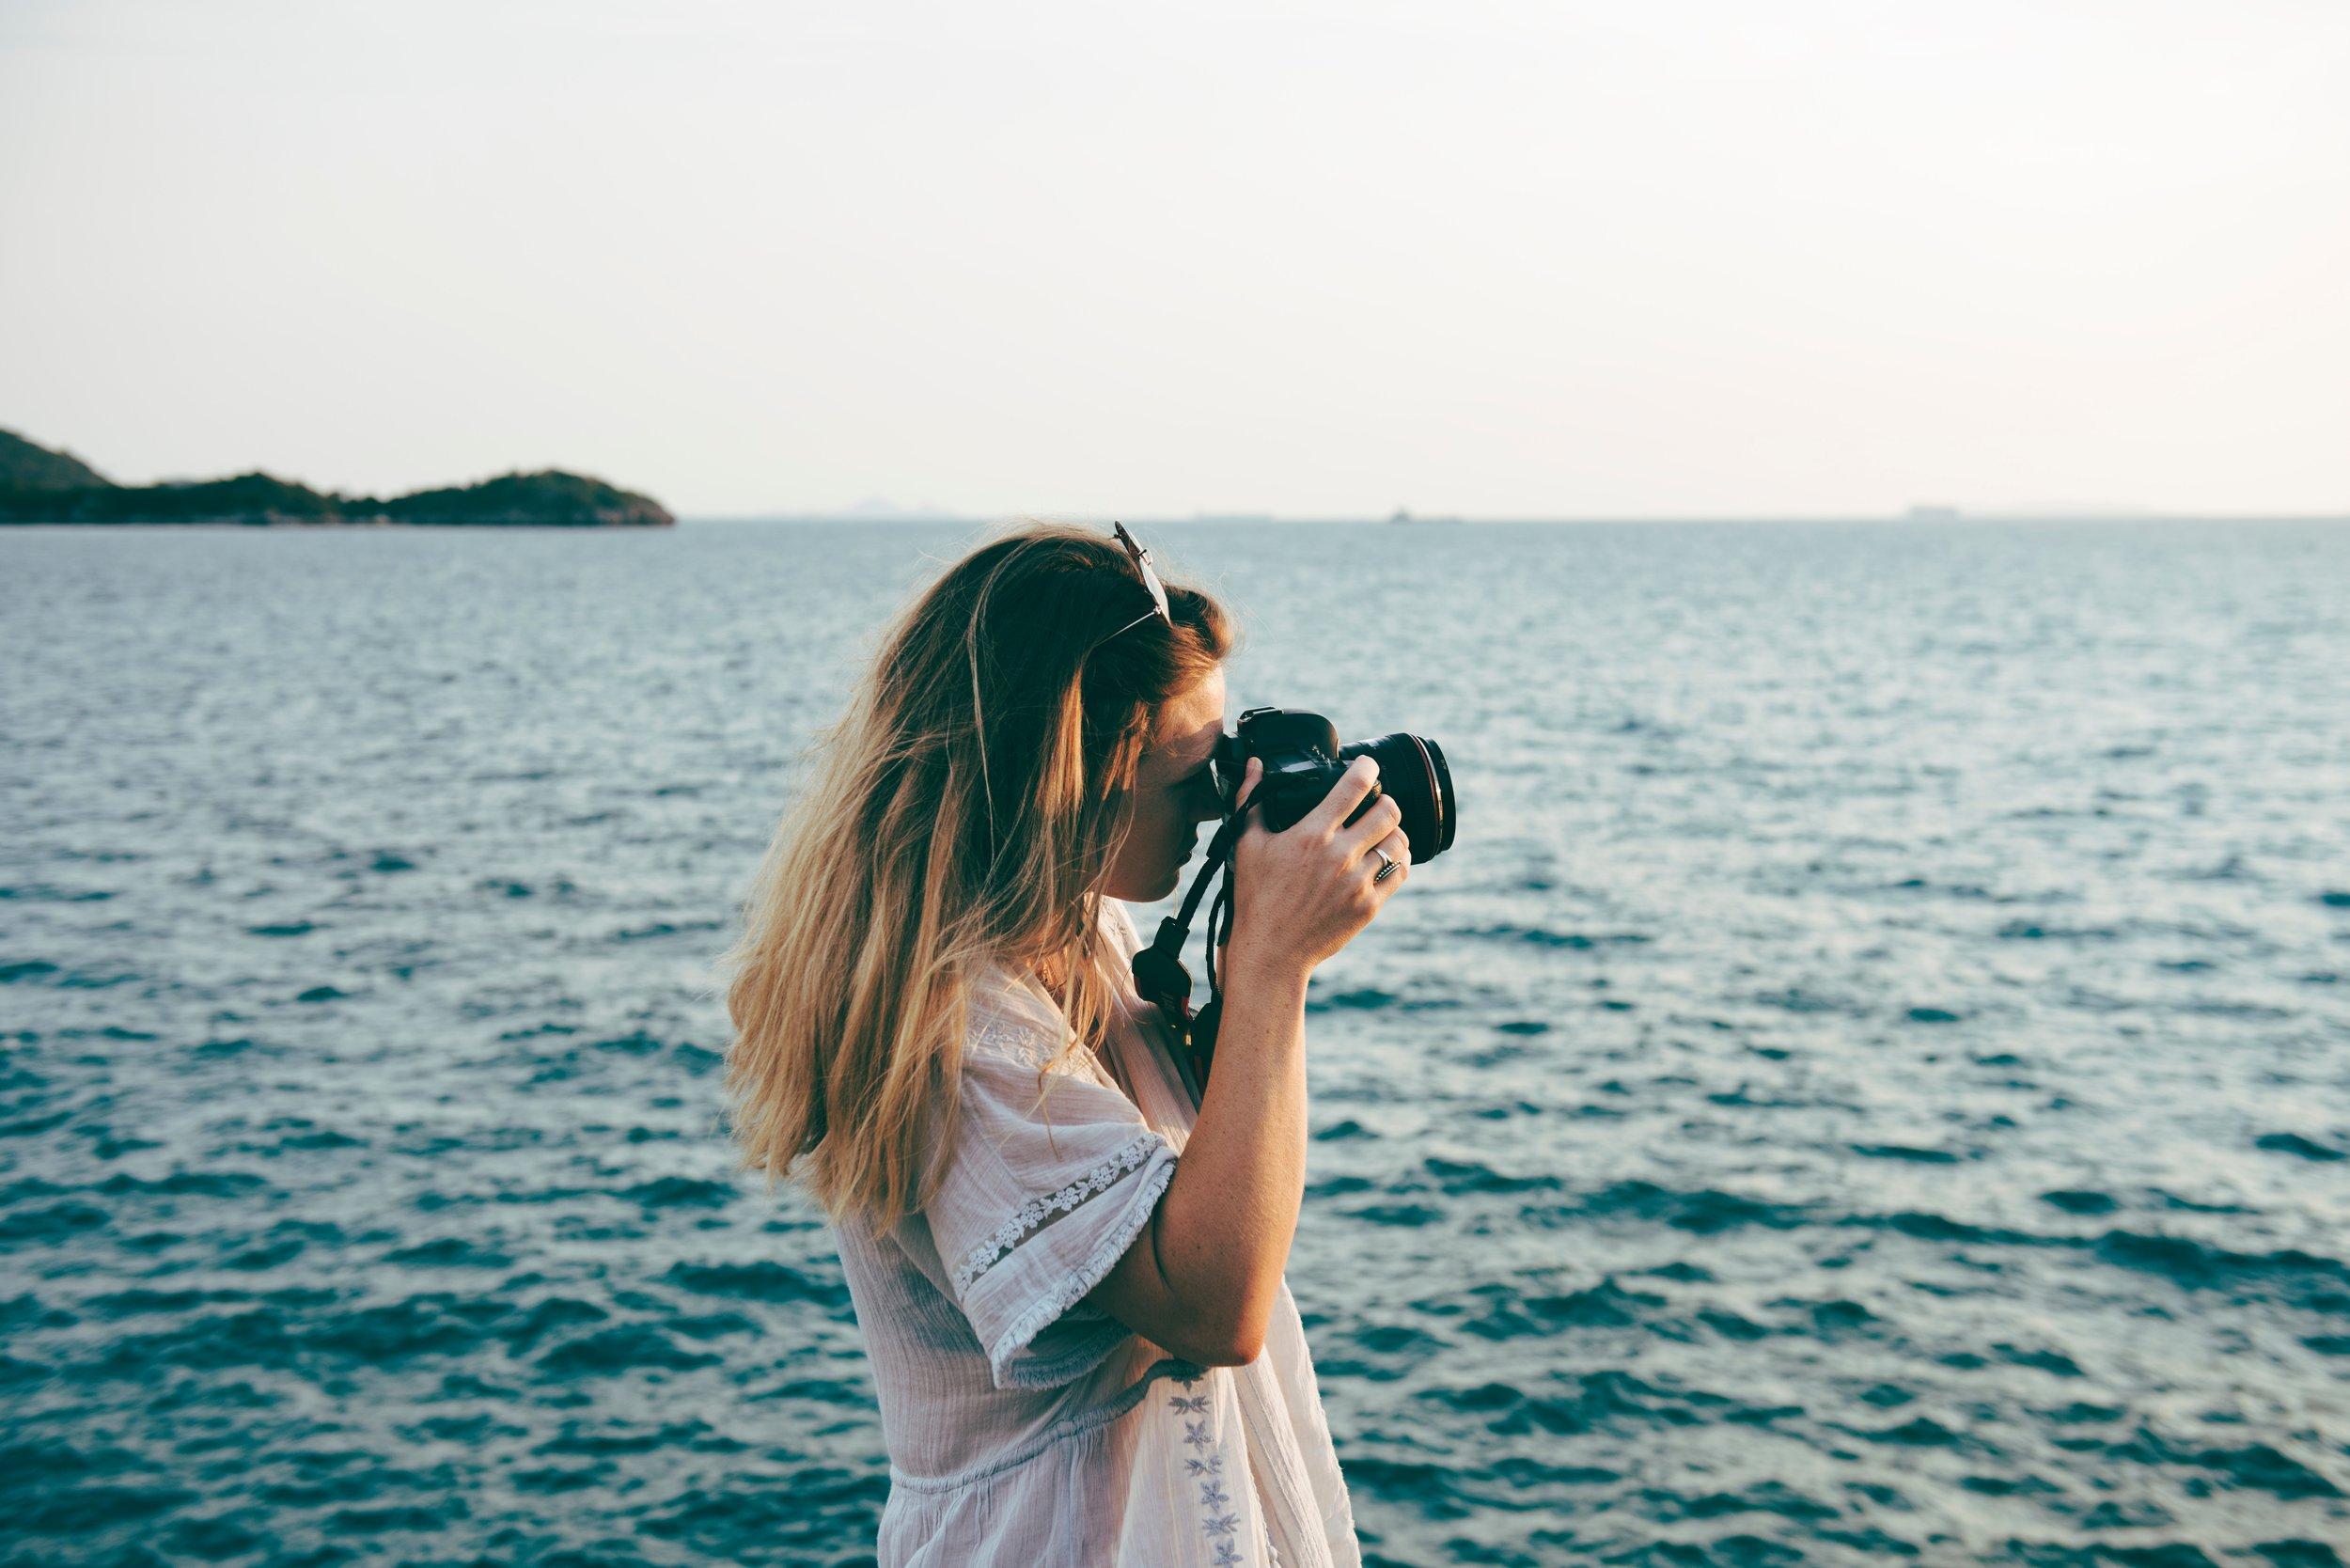 beach-calm-camera-423366.jpg